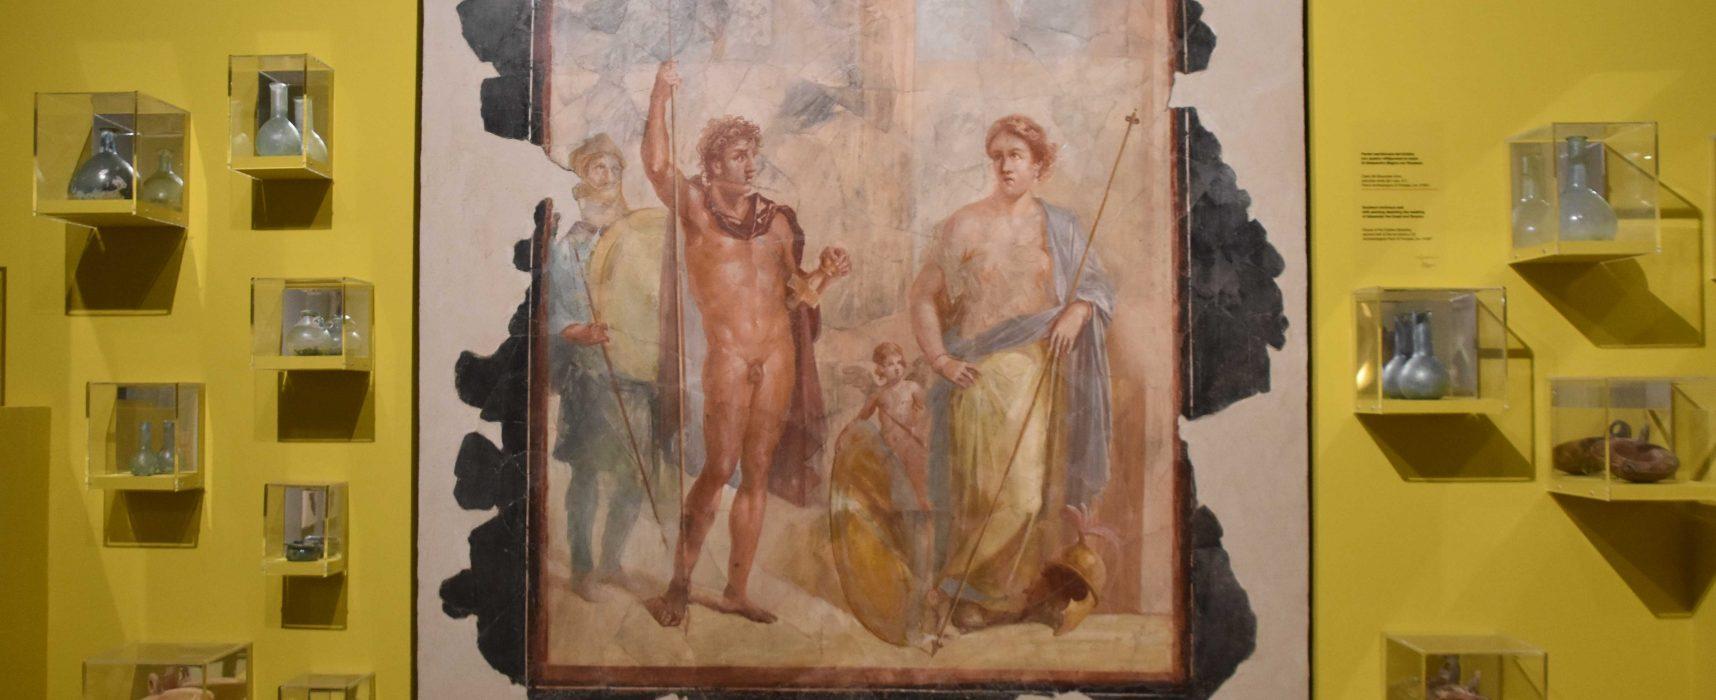 Pompei, in mostra i tesori sotto i lapilli